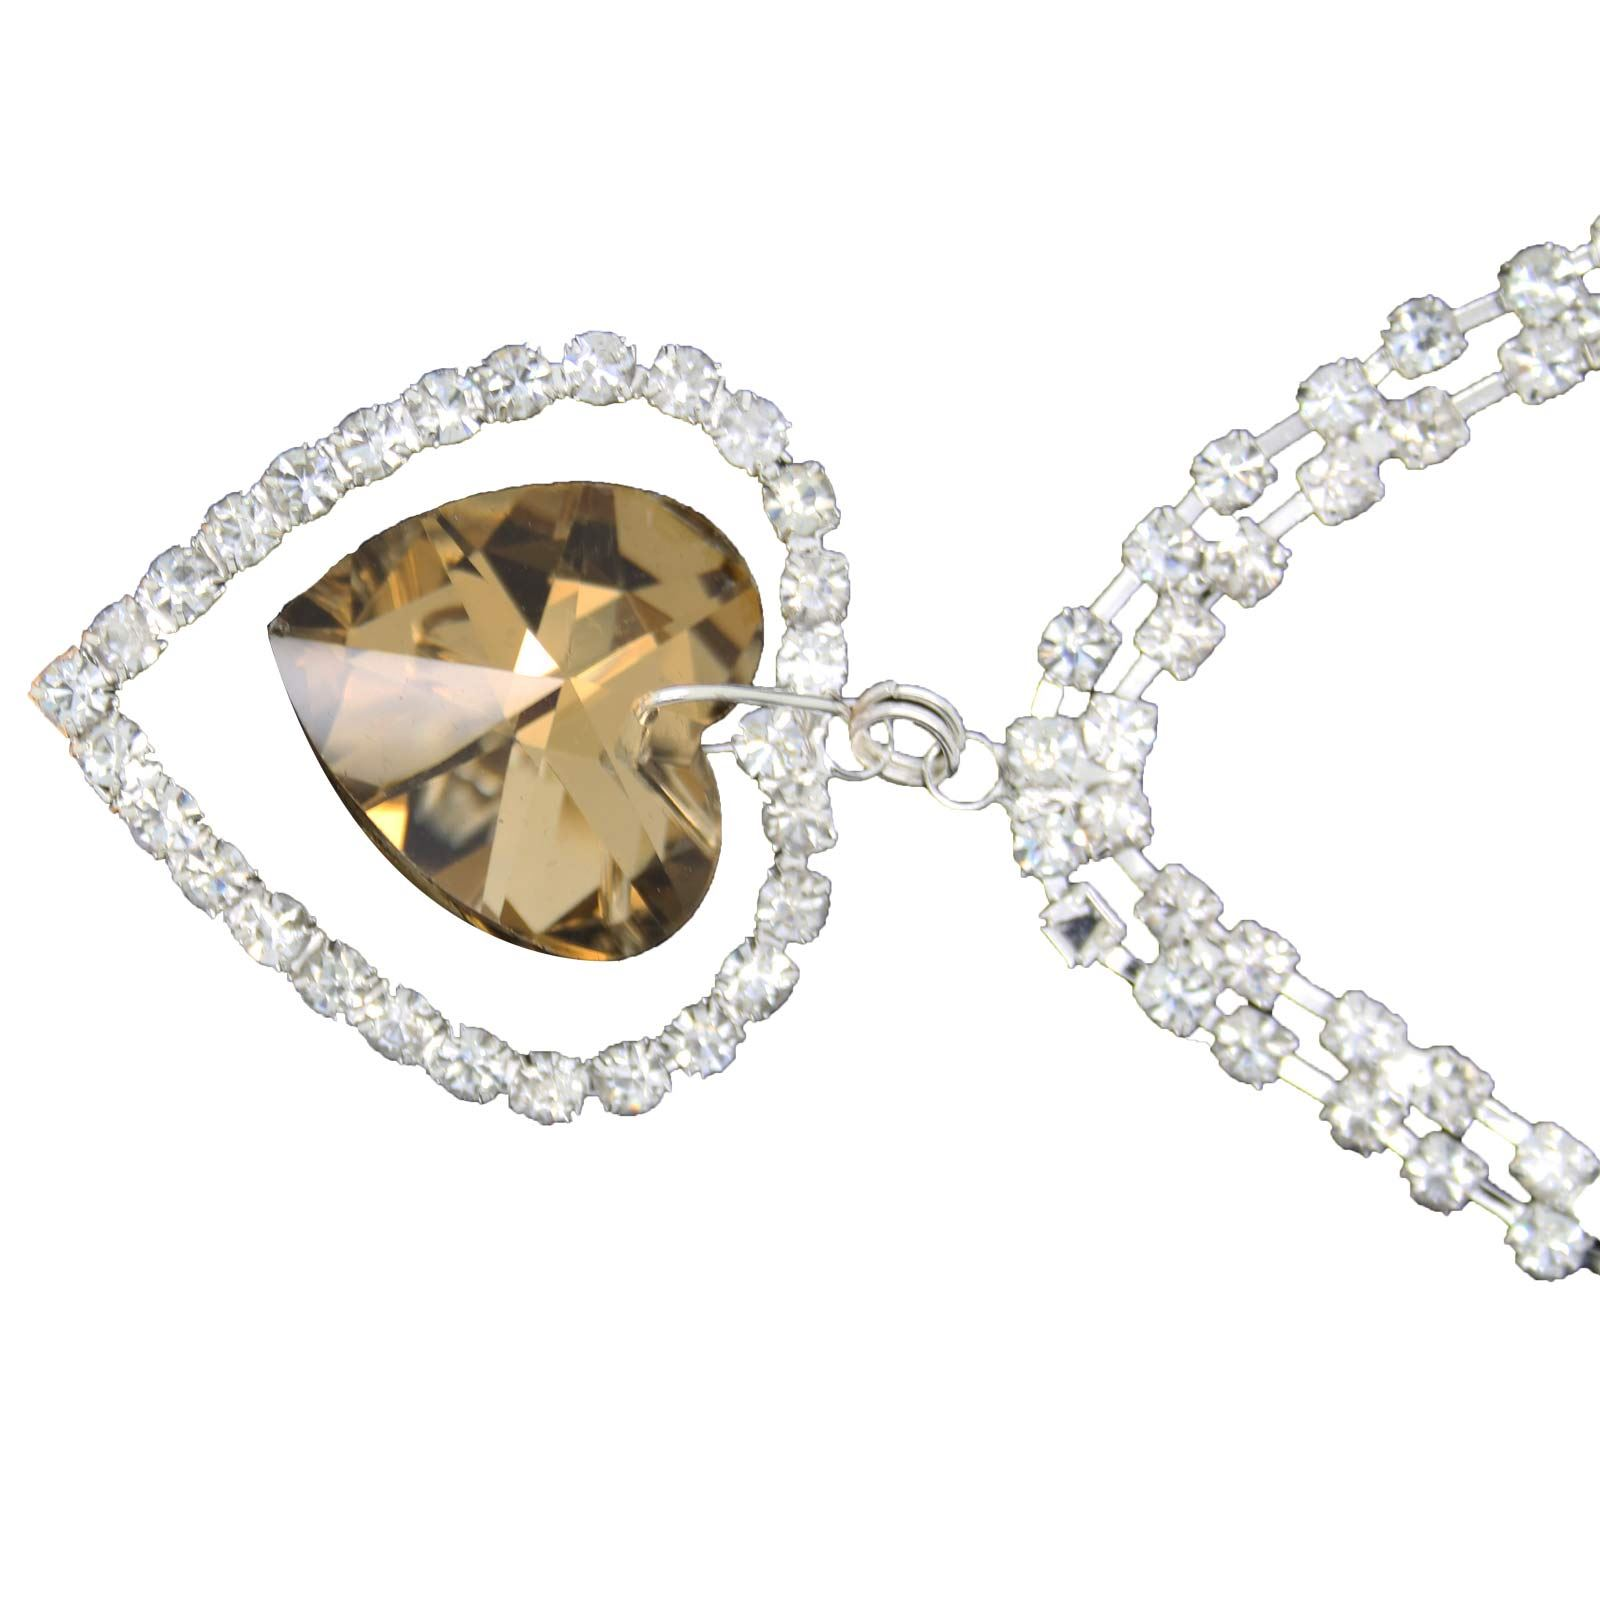 True-Face-Ladies-Women-039-s-Elegant-Earrings-Necklace-Set-Metal-Alloy-Jewellery thumbnail 39